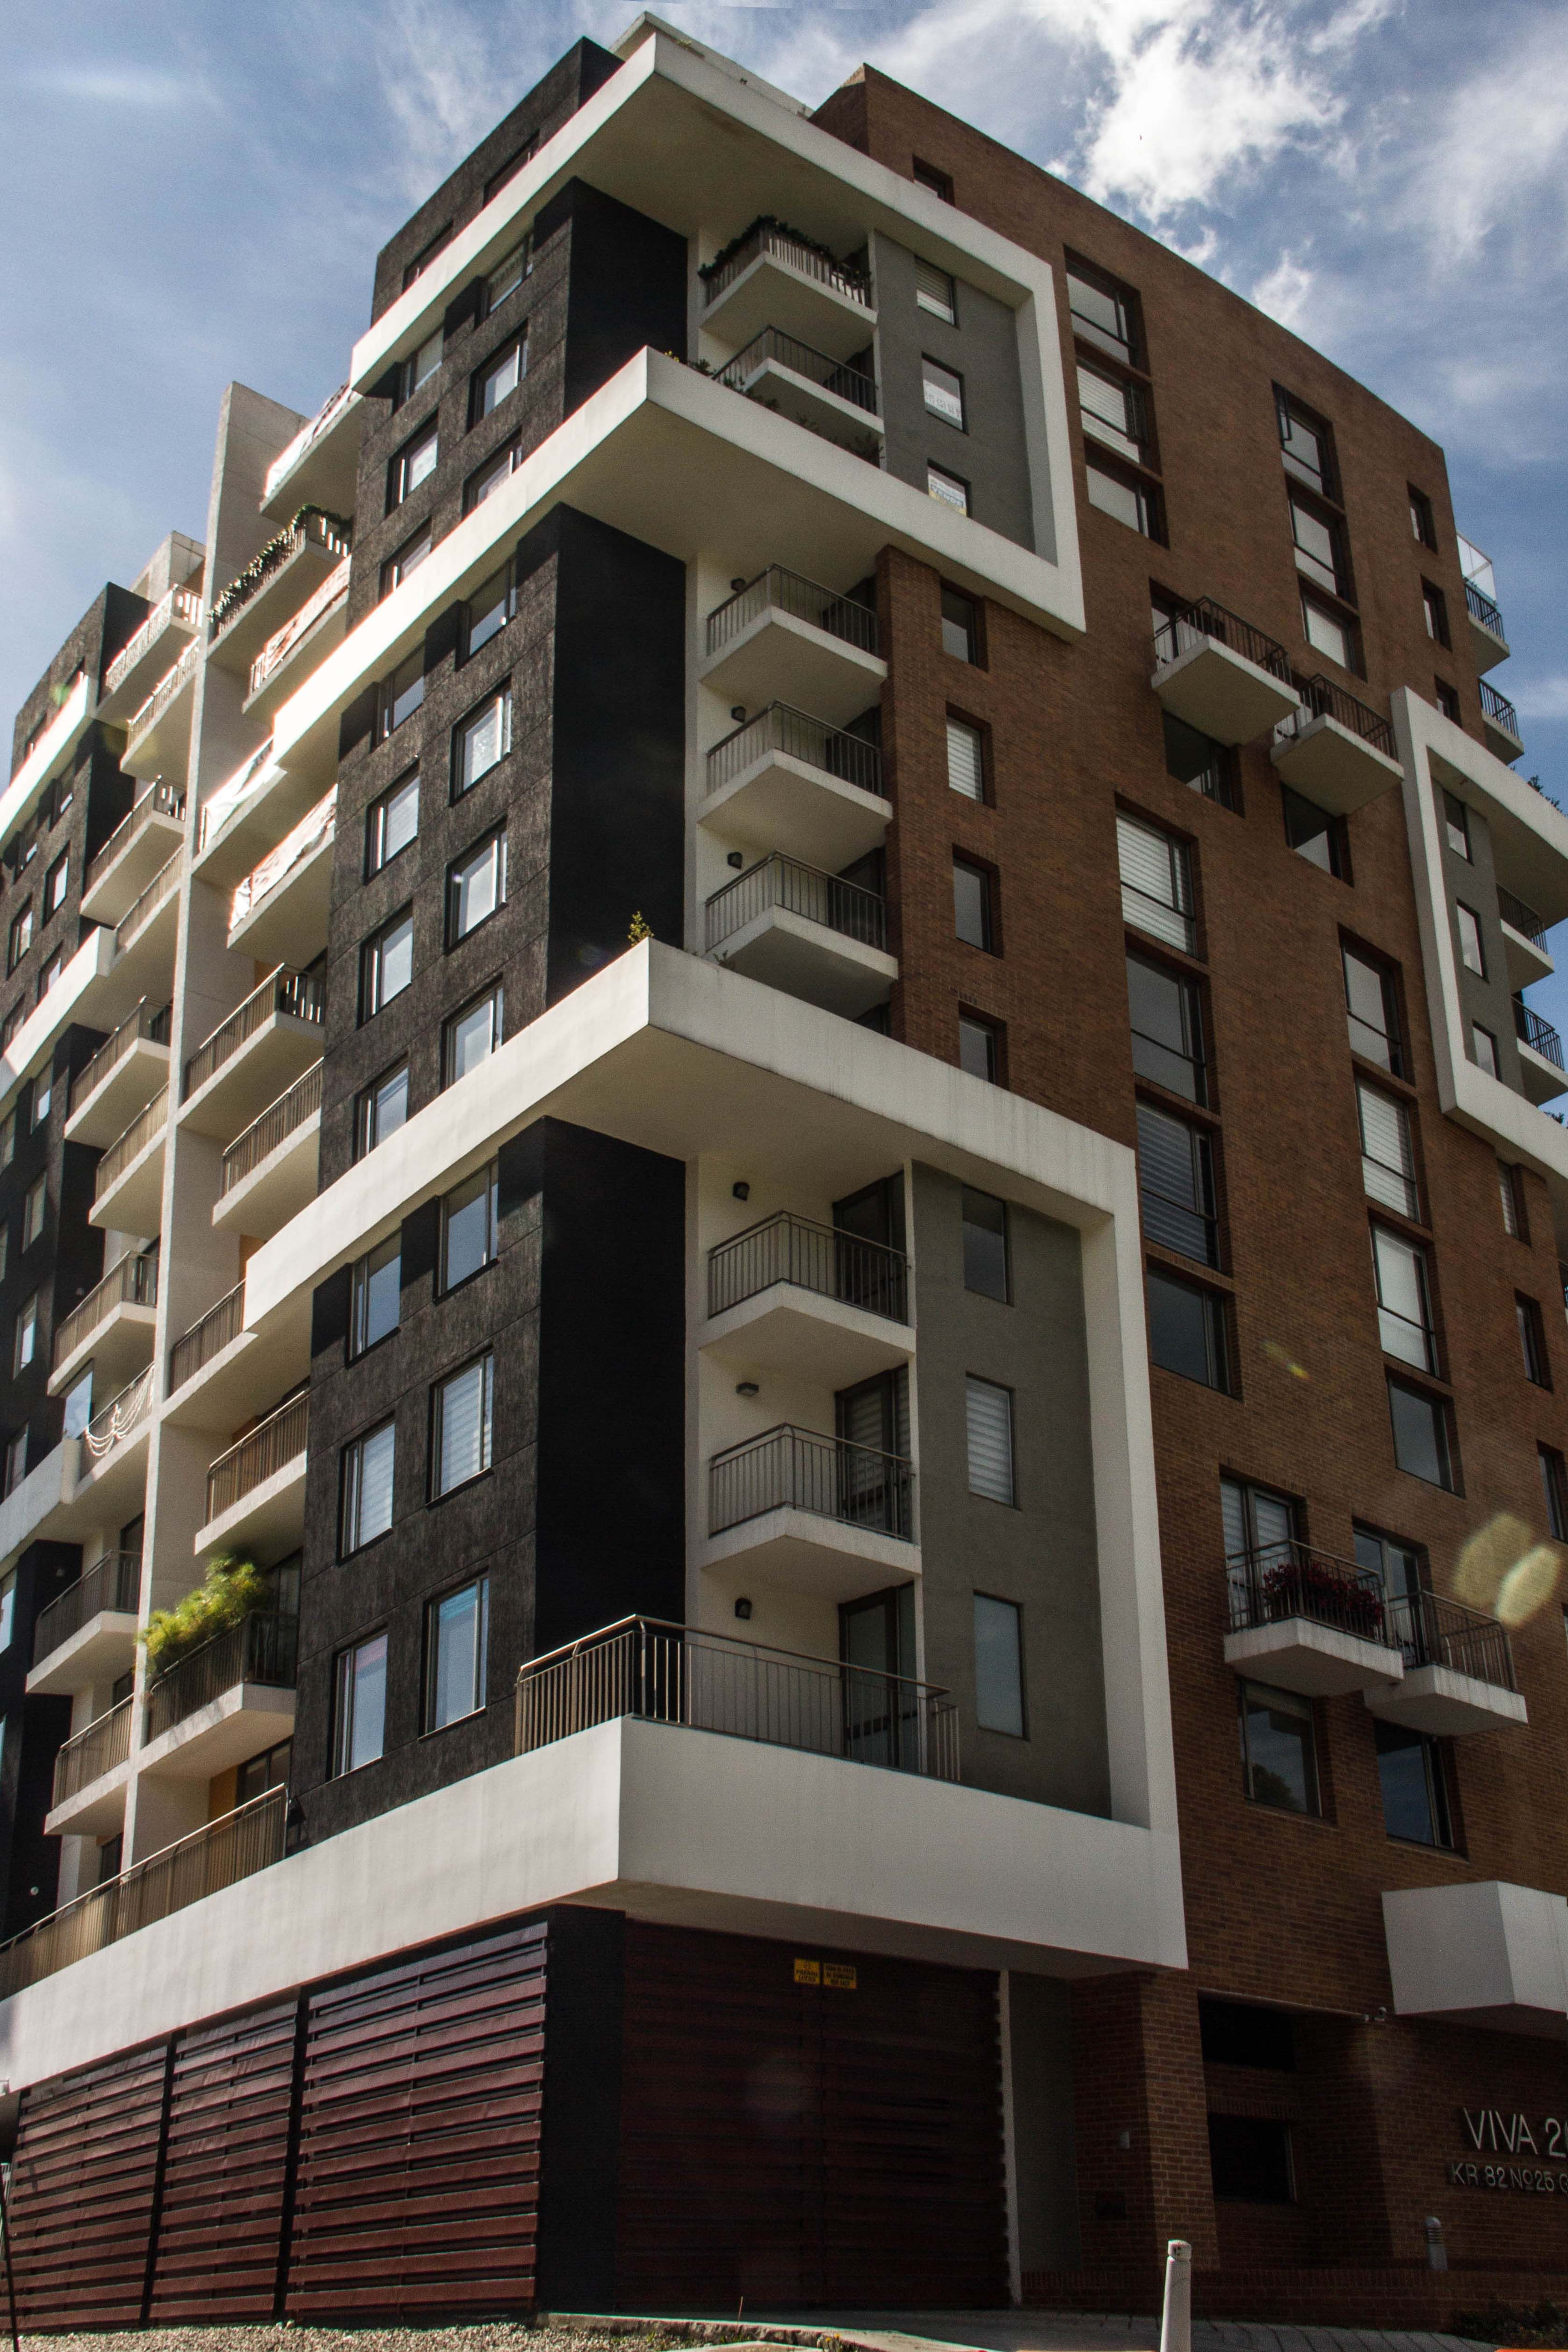 Corner View Tower 1 Viva 26 Bogota Colombia Modern Buildings Building Facade Brick Architecture